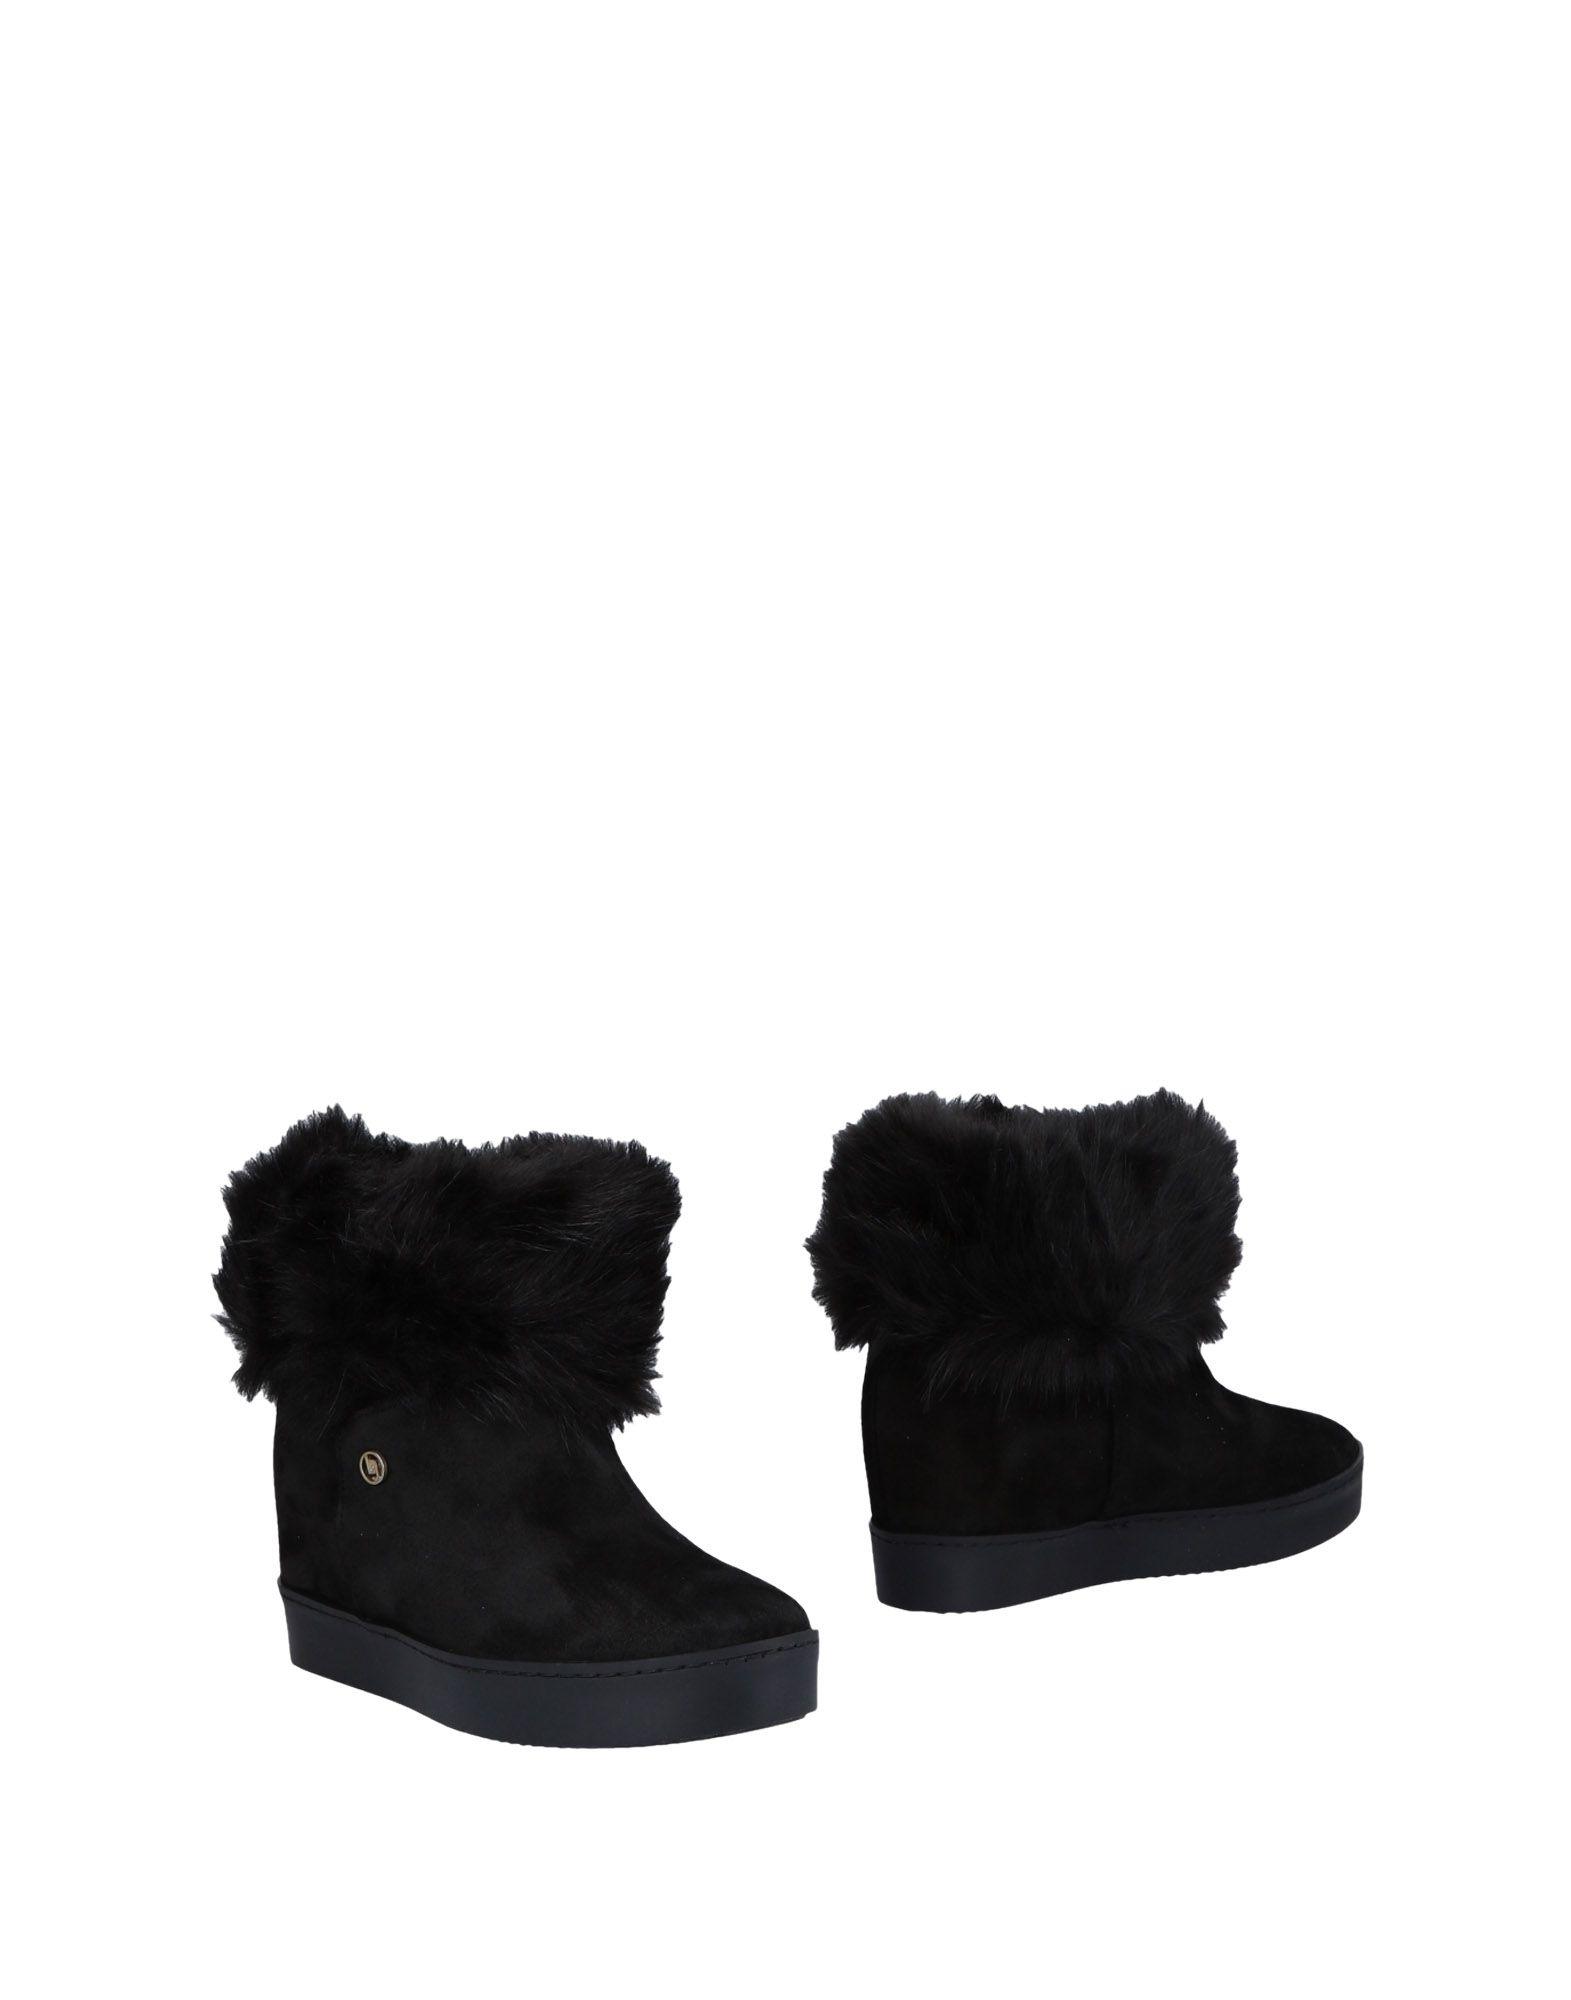 Bottine Liu •Jo Femme - Chaussures Bottines Liu •Jo Noir Chaussures - casual sauvages a3beda